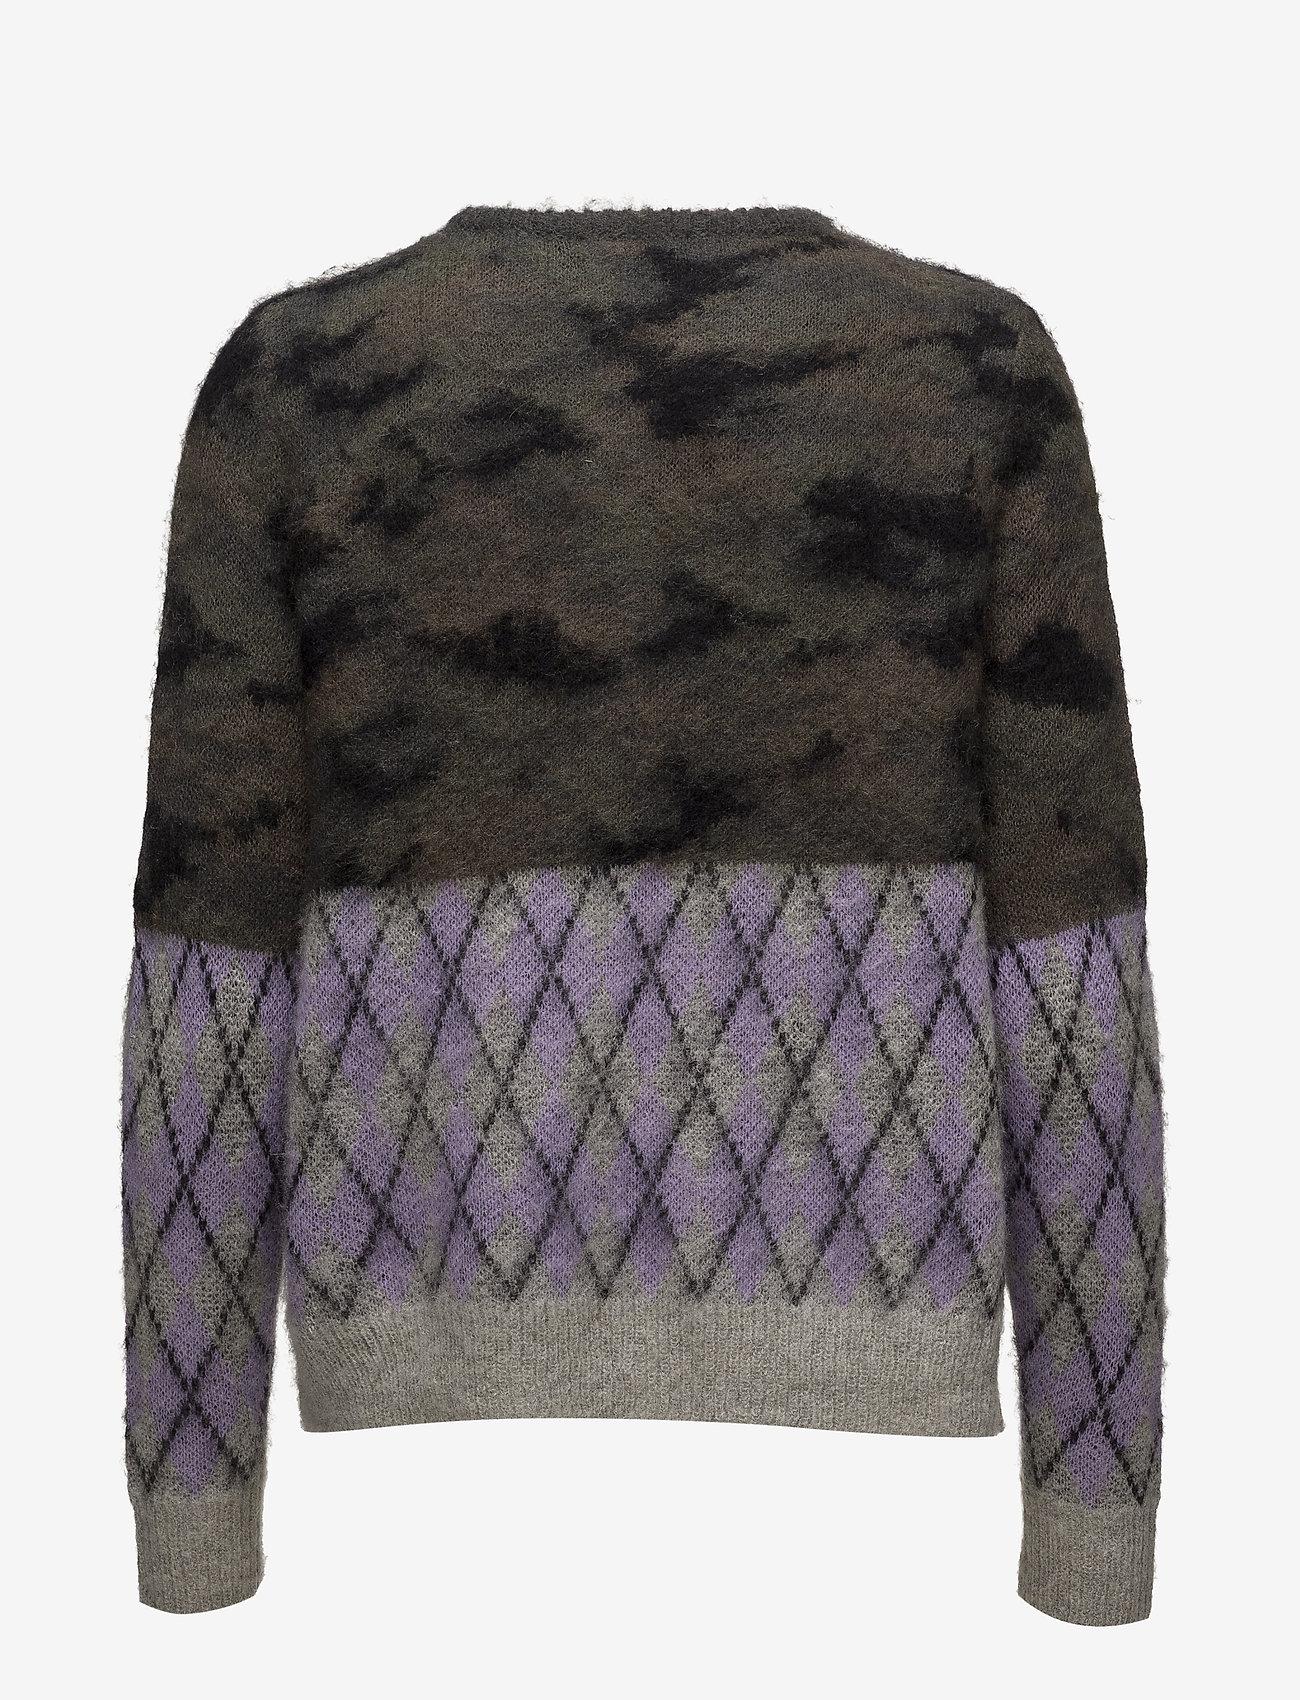 Coster Copenhagen Sweater in mixed camouflage and che - Dzianina CAMOUFLAGE - Kobiety Odzież.